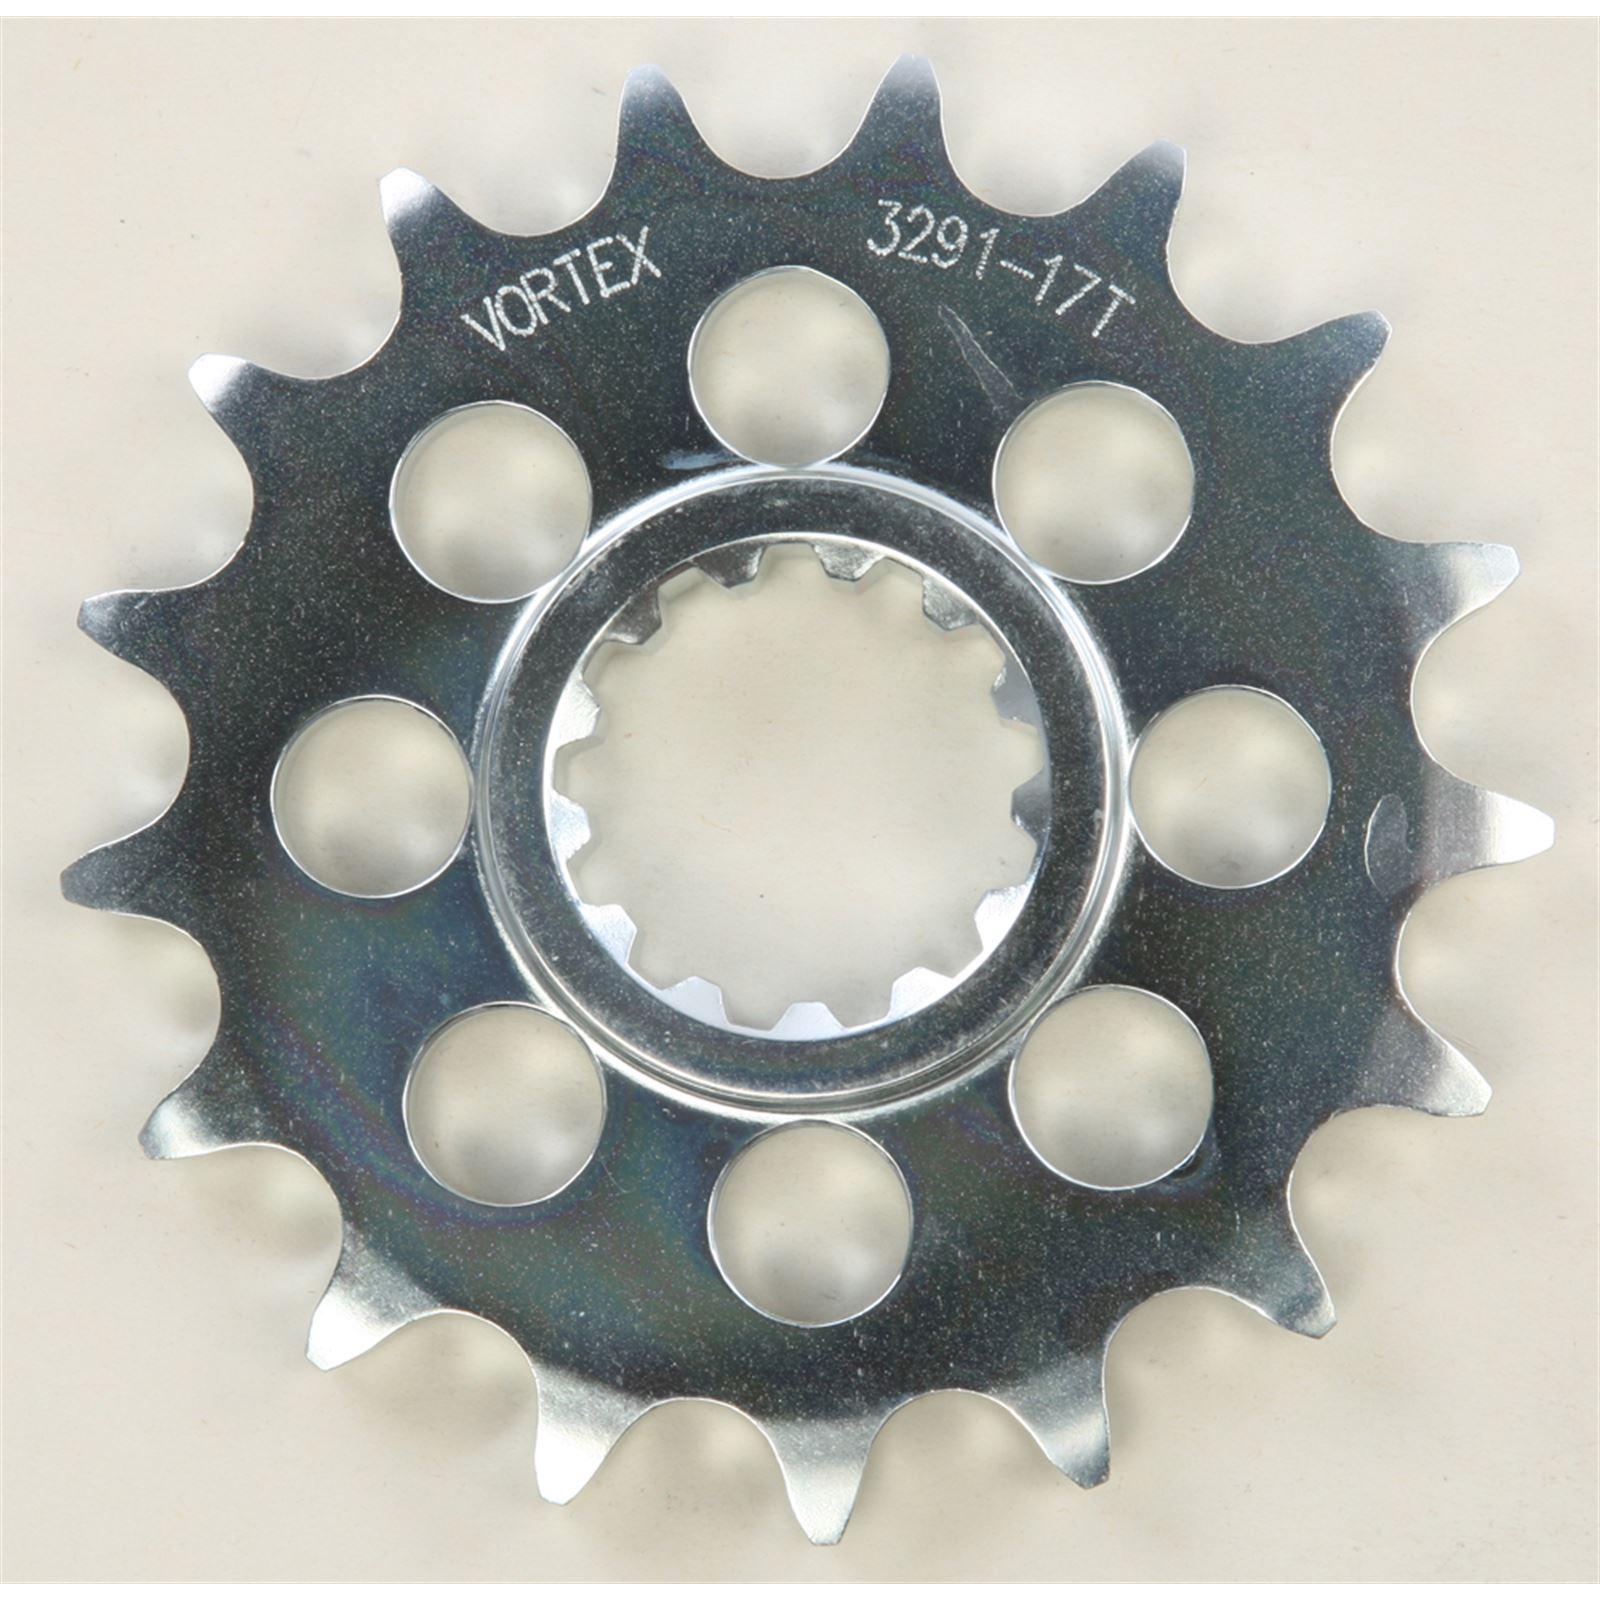 Vortex Front C/S Steel Sprocket